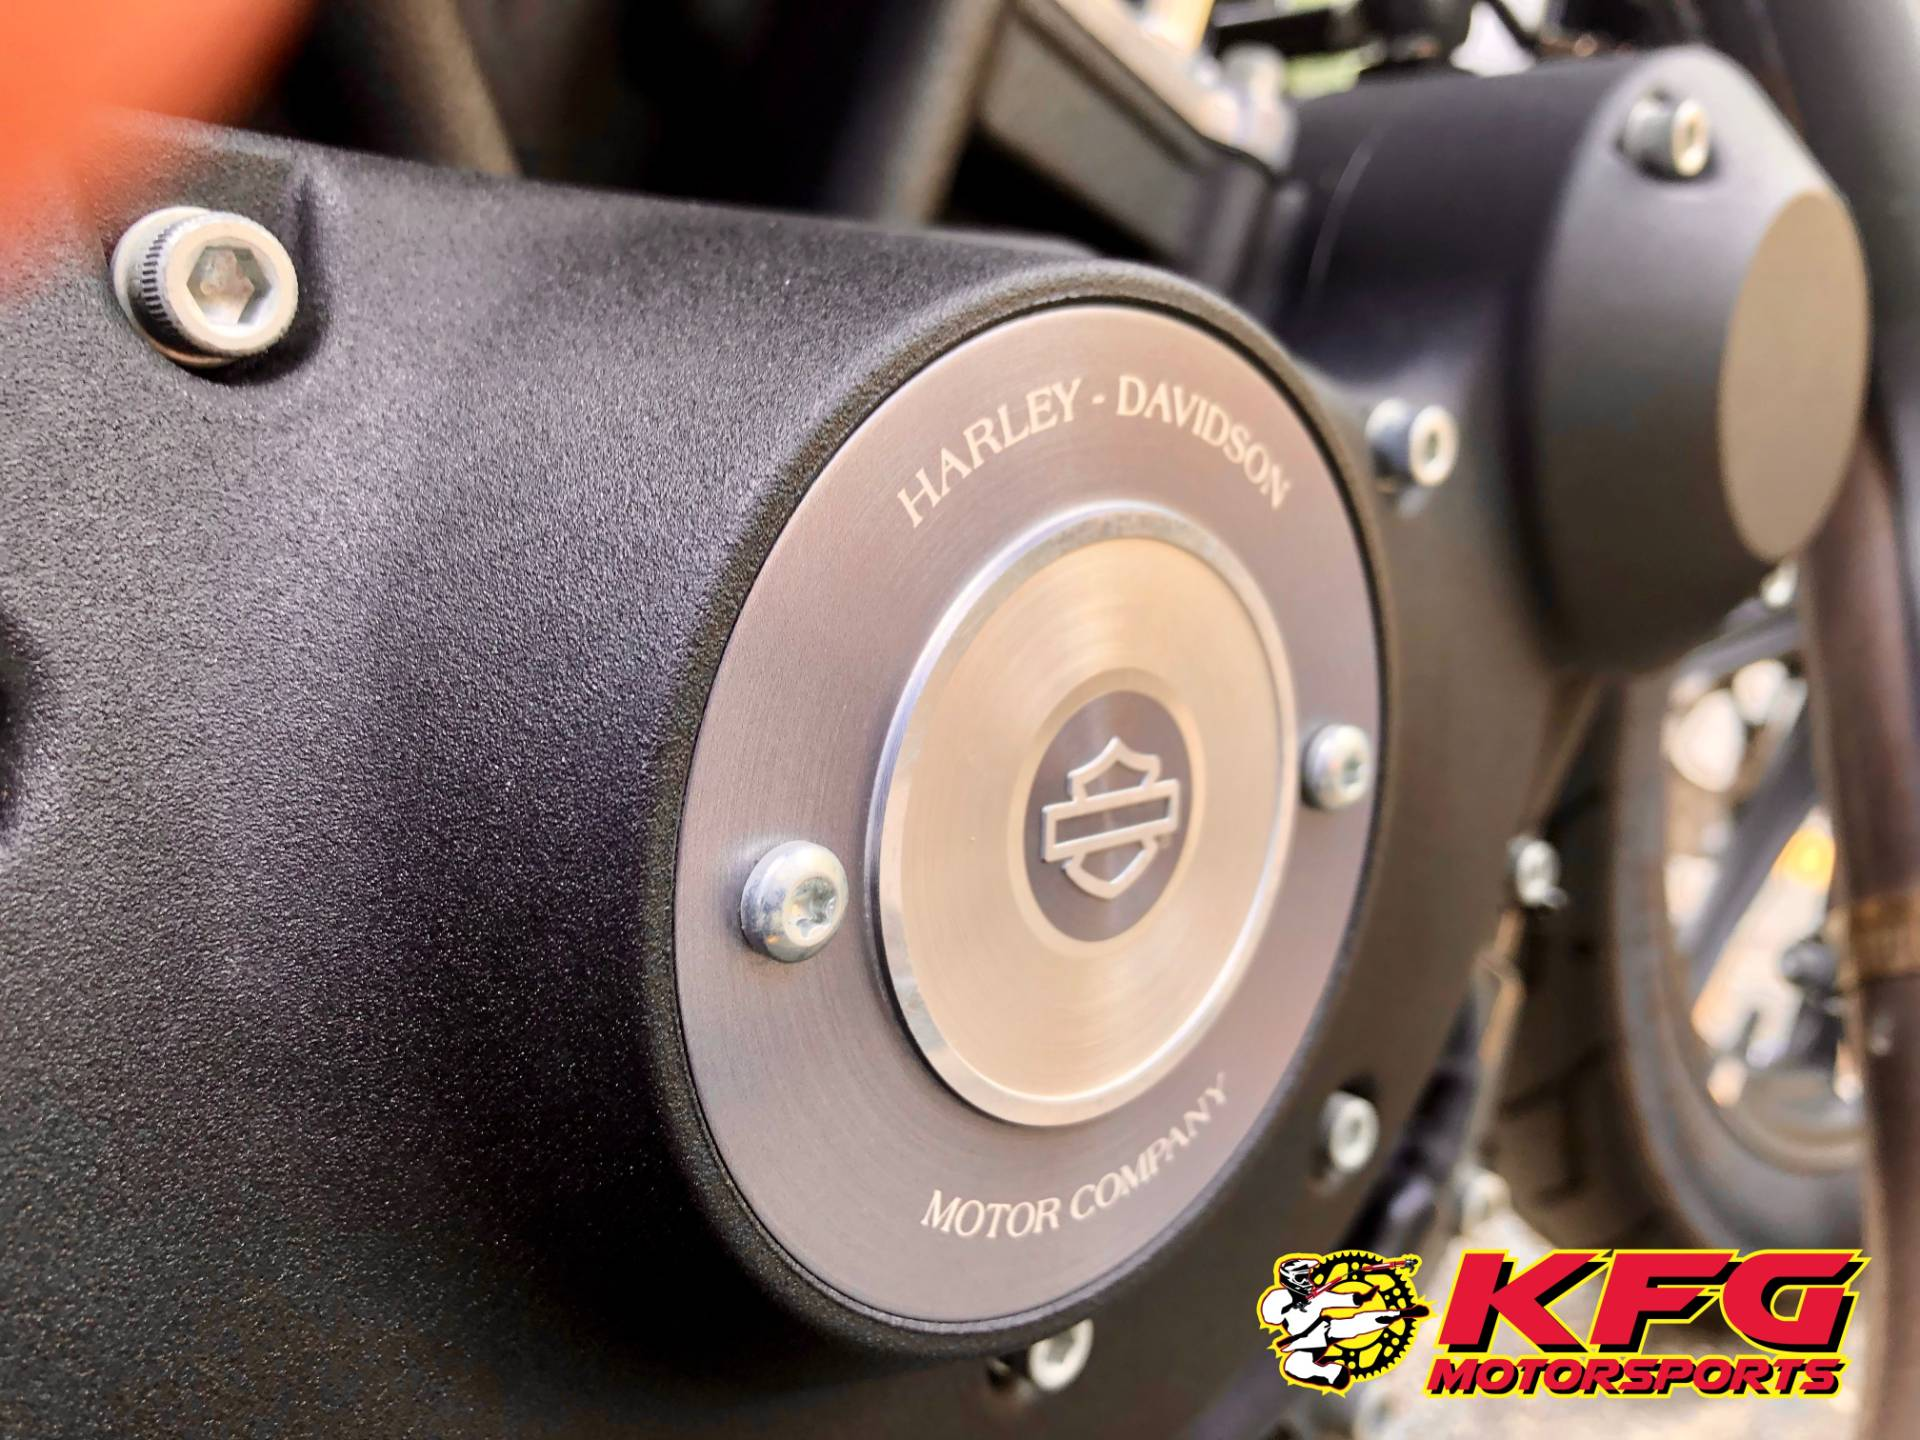 Used 2016 Harley-Davidson Iron 883™ Motorcycles in Auburn